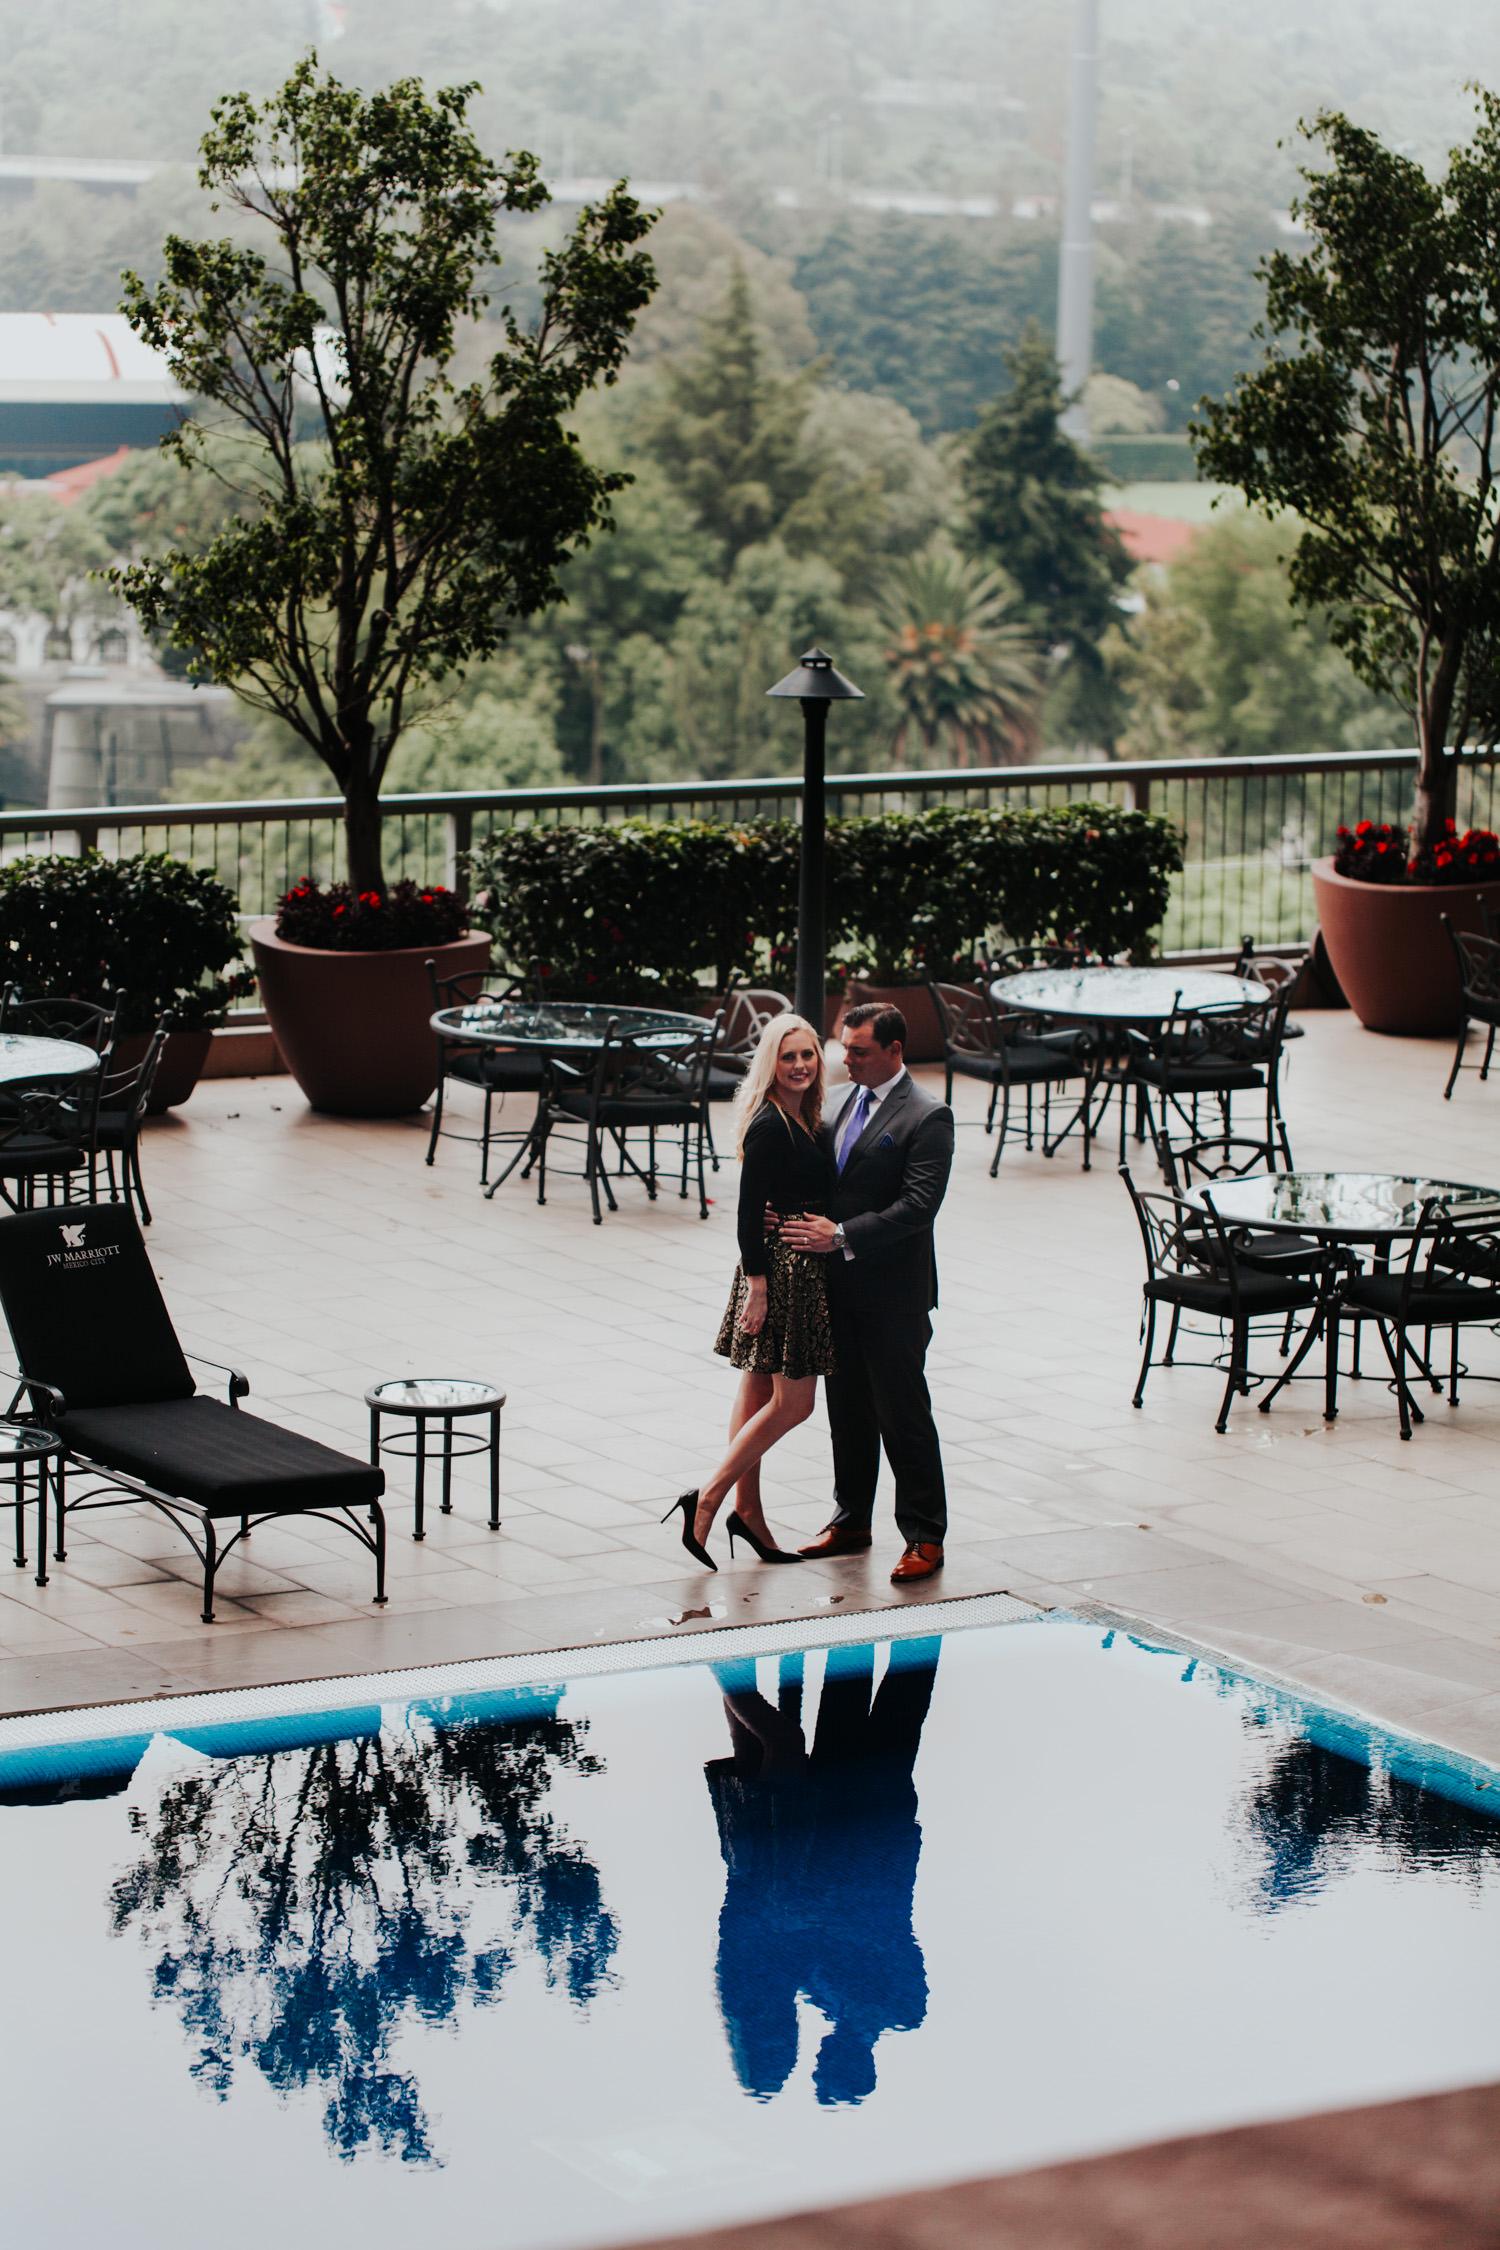 fotografo-mexico-df-boda-wedding-jw-marriot-hotel-polanco-chapultepec-pierce-4.jpg